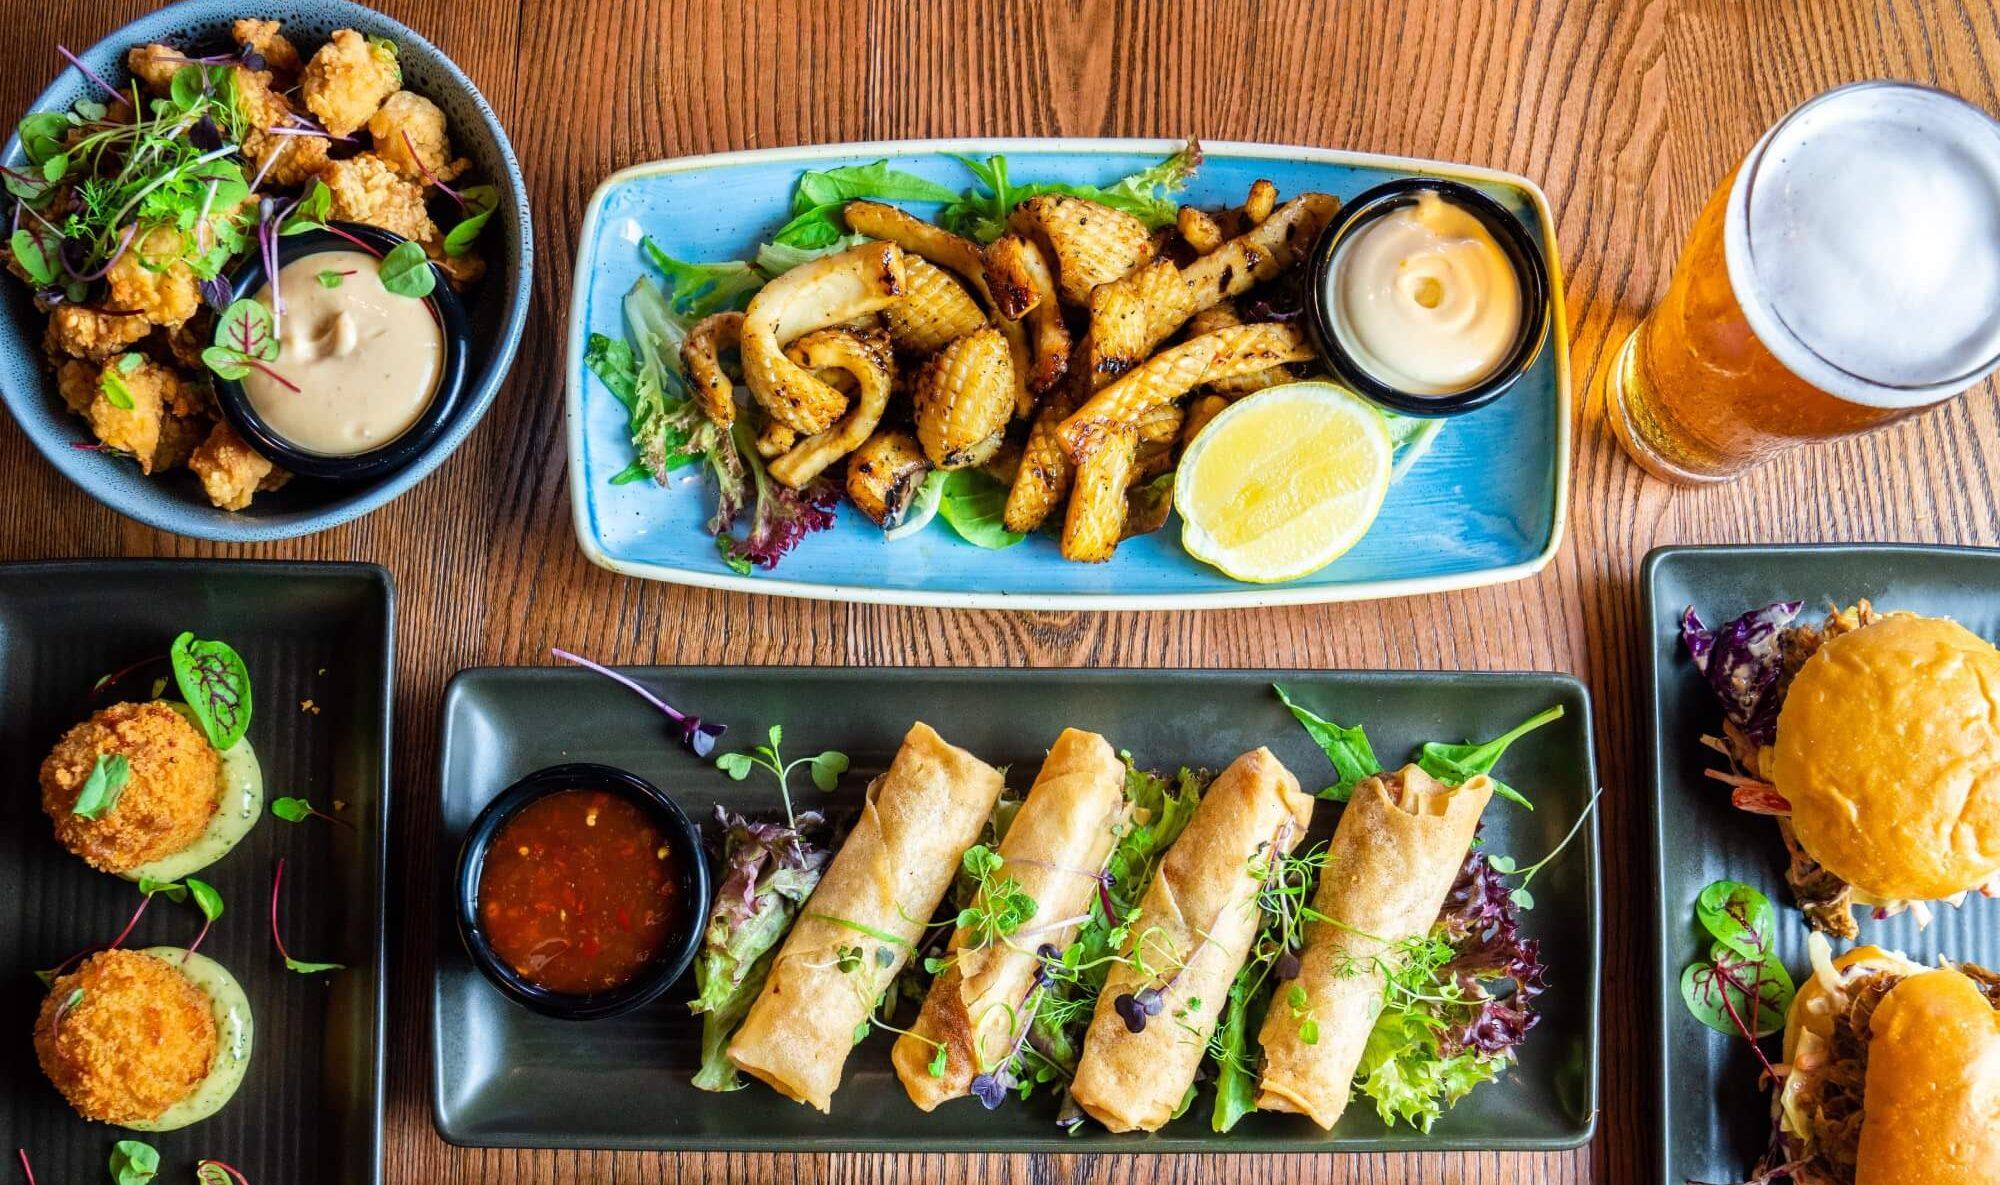 Sydney Junction Hotel food